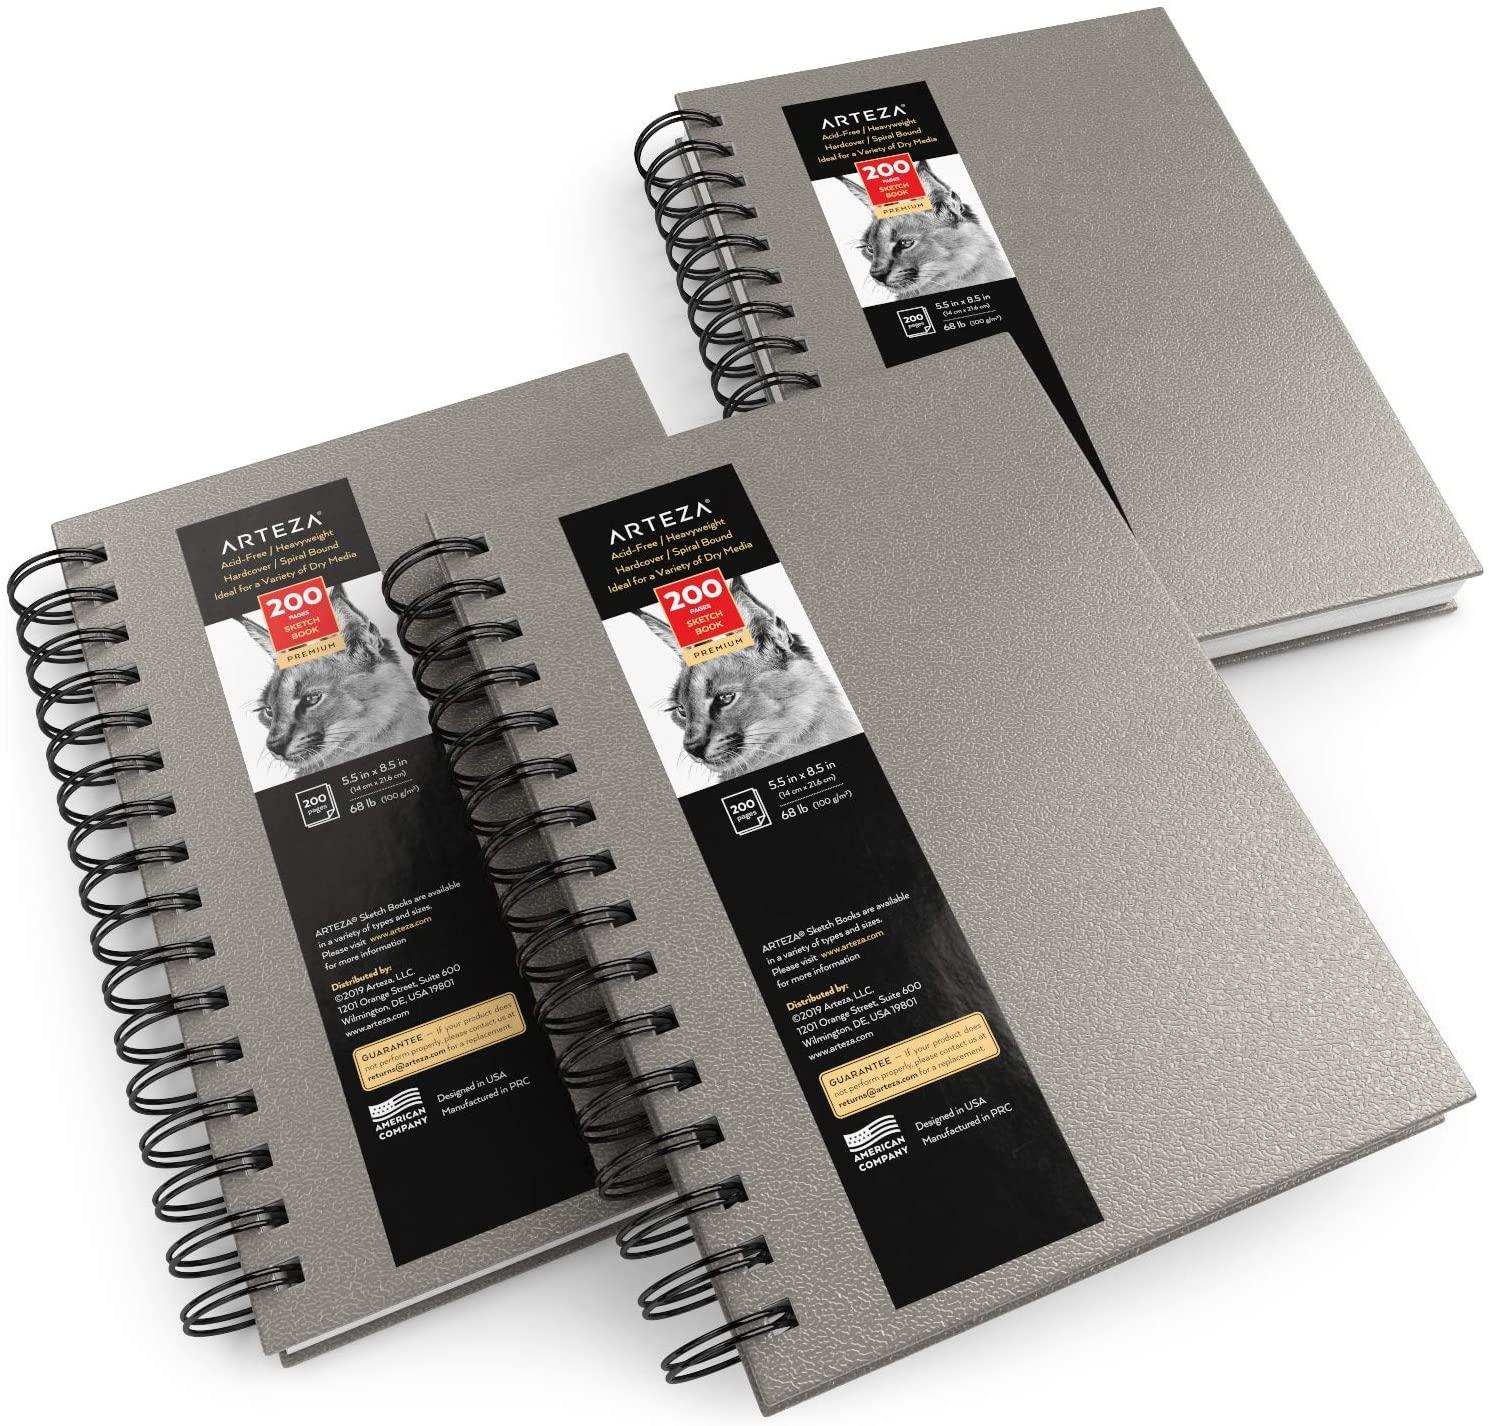 "Sketchbook, Spiral-Bound Hardcover, Gray, 5.5x8.5"" - Pack of 3"